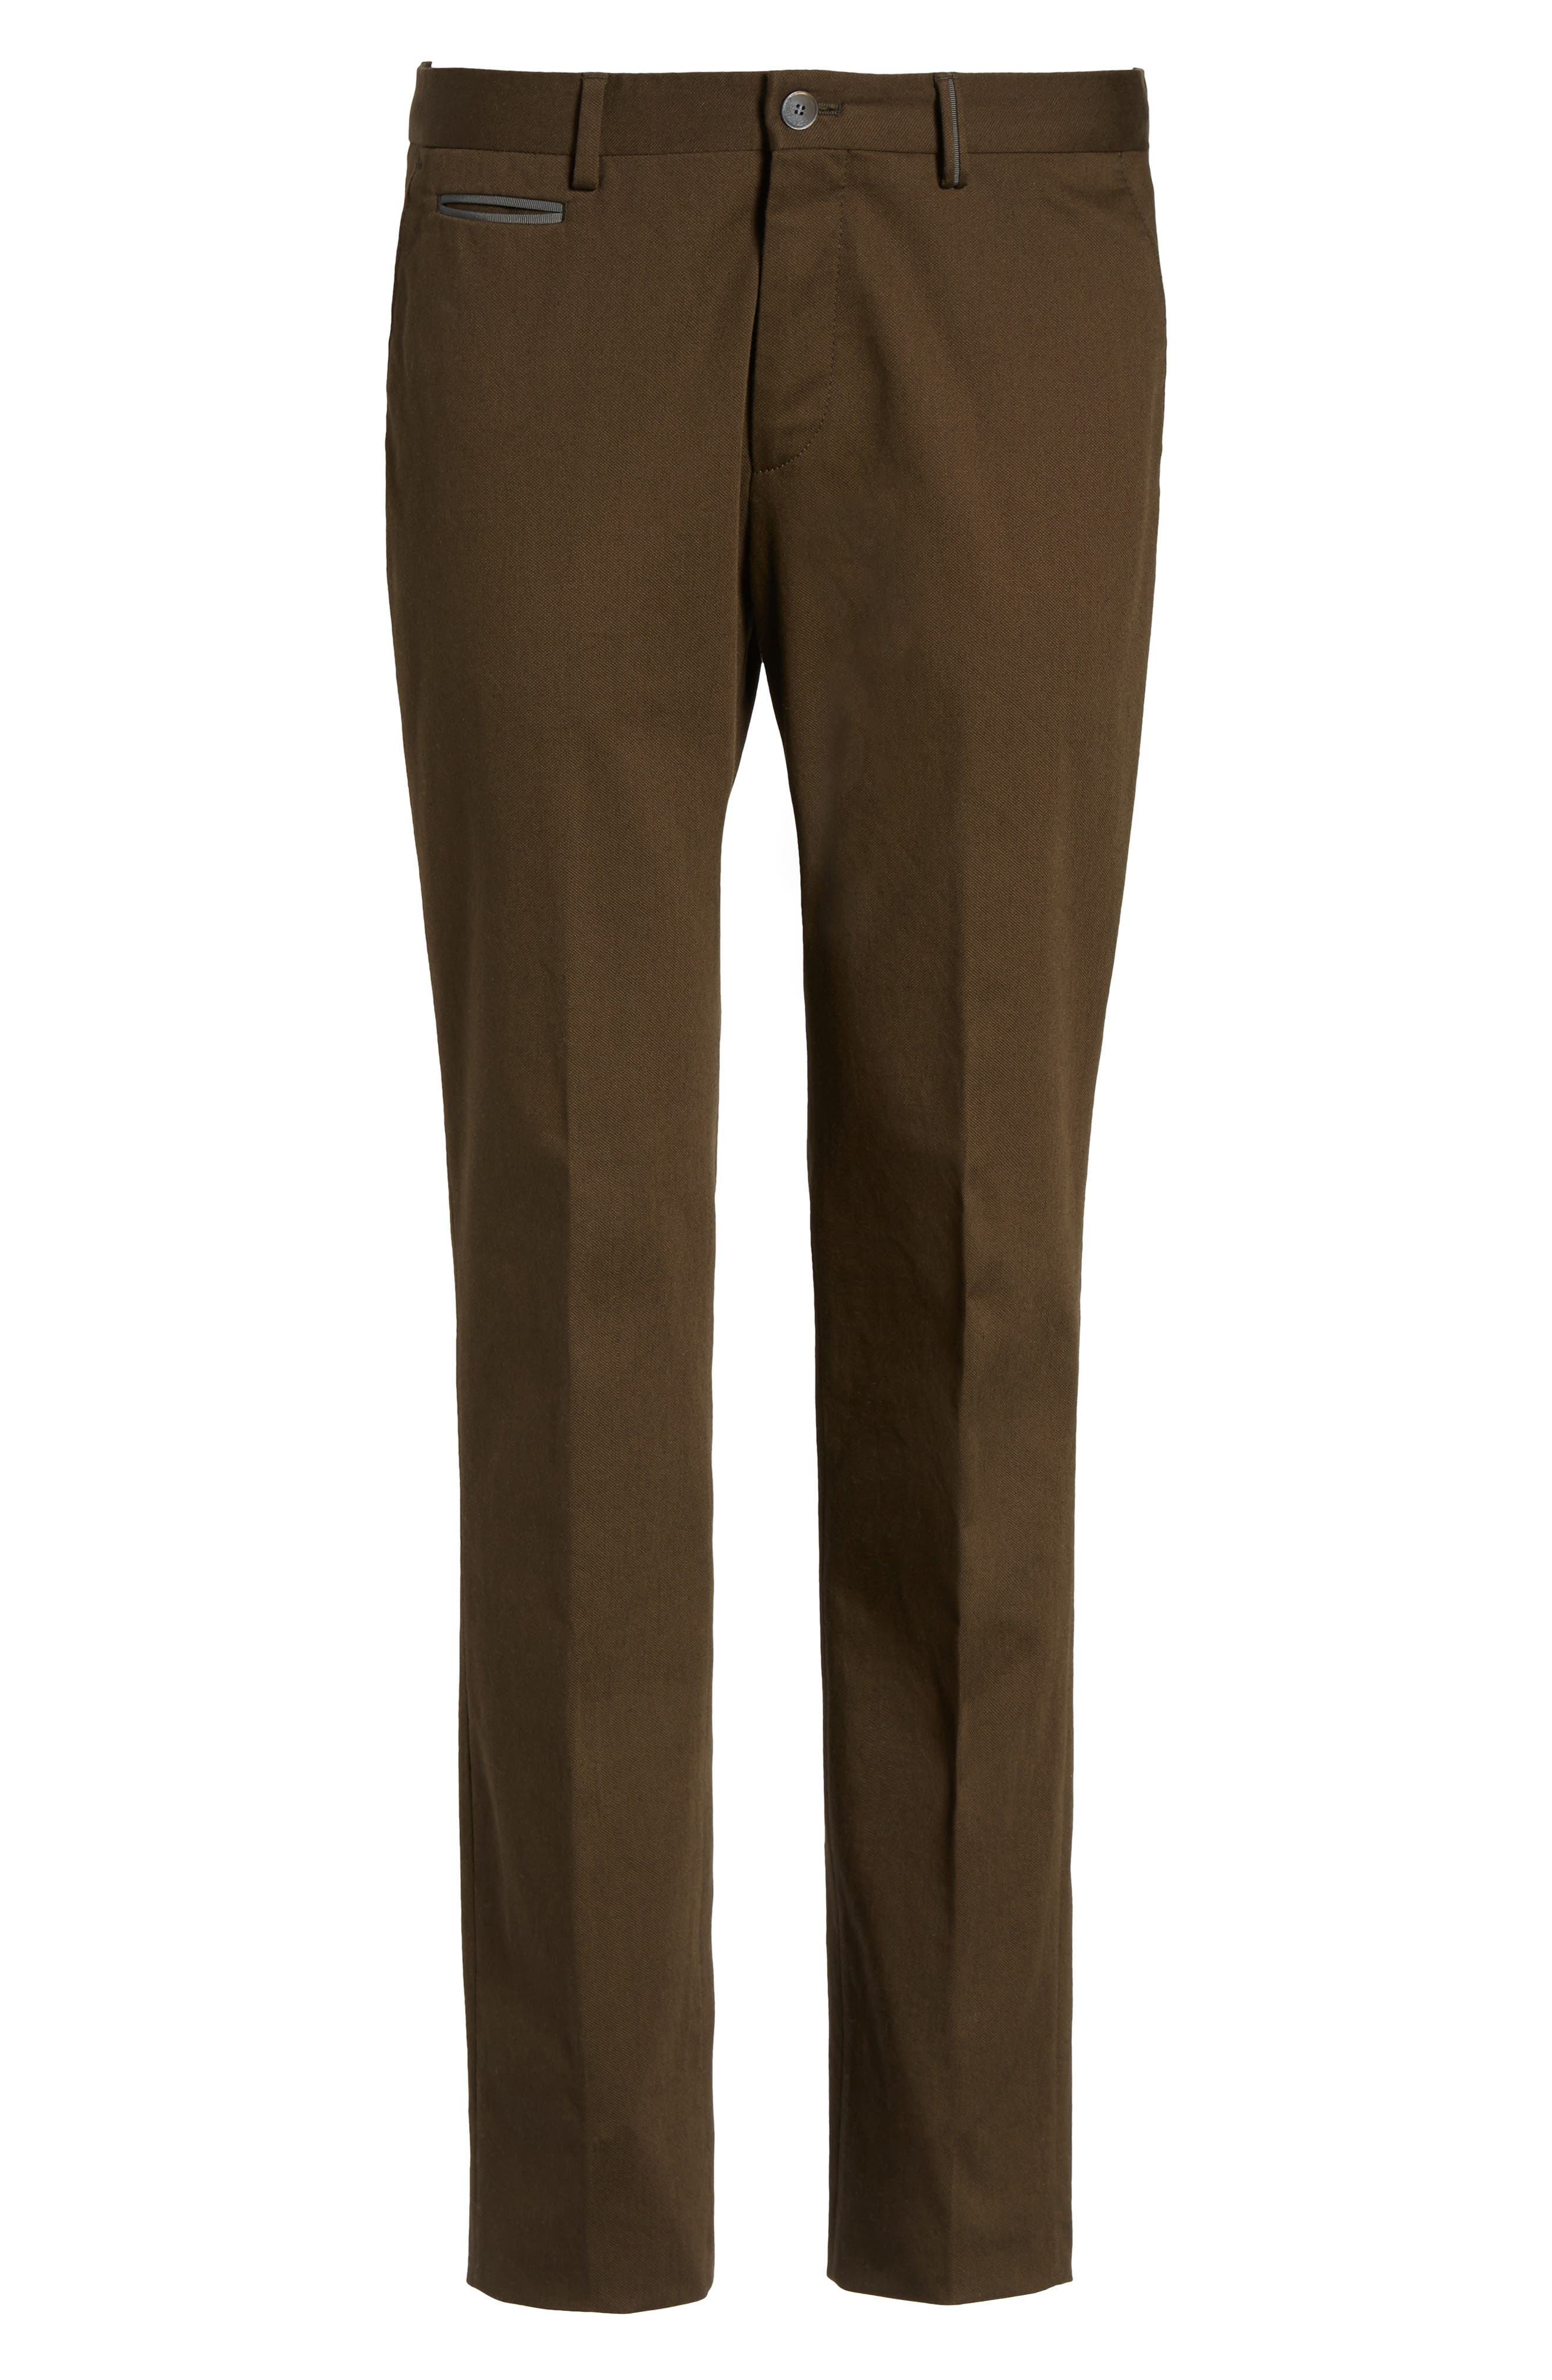 Batho-W Regular Fit Trousers,                             Alternate thumbnail 6, color,                             Open Green